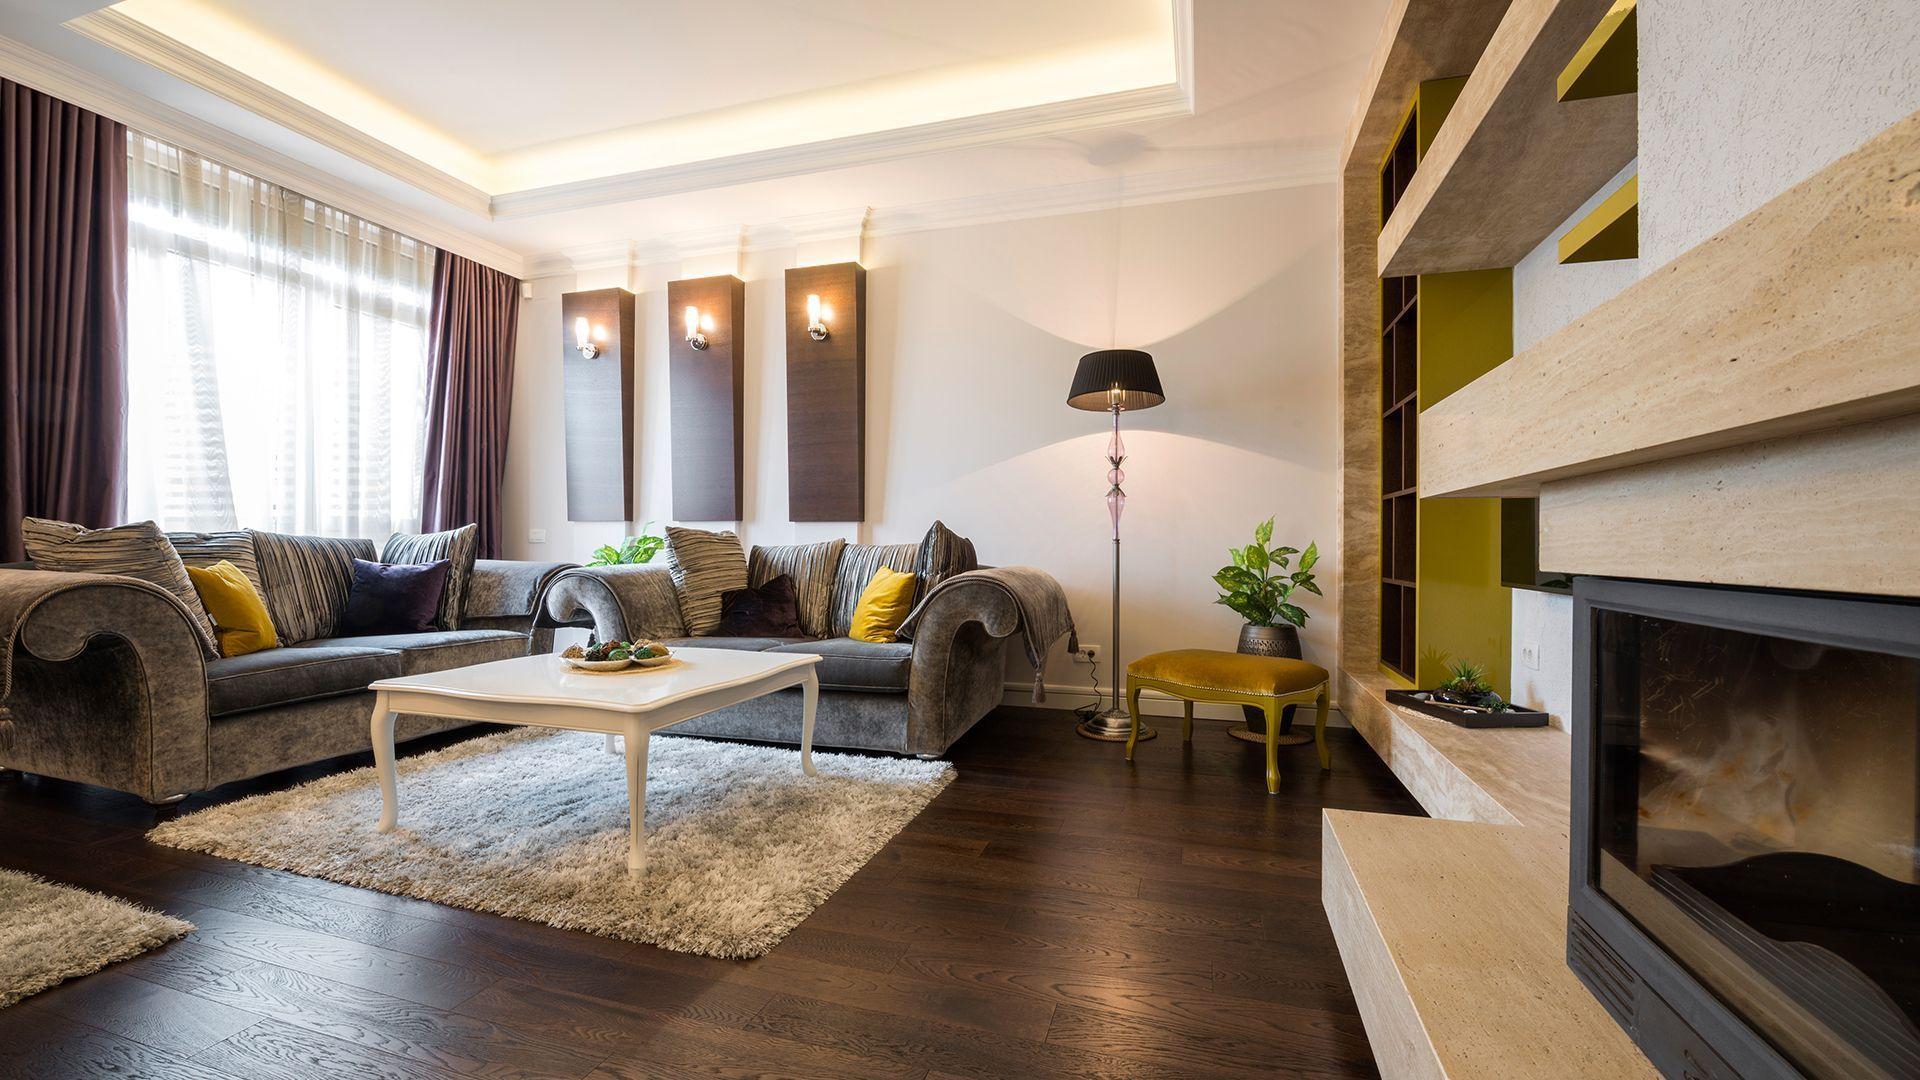 Nieuwe woonkamer – interieuradvies in de regio Goes, Middelburg en ...